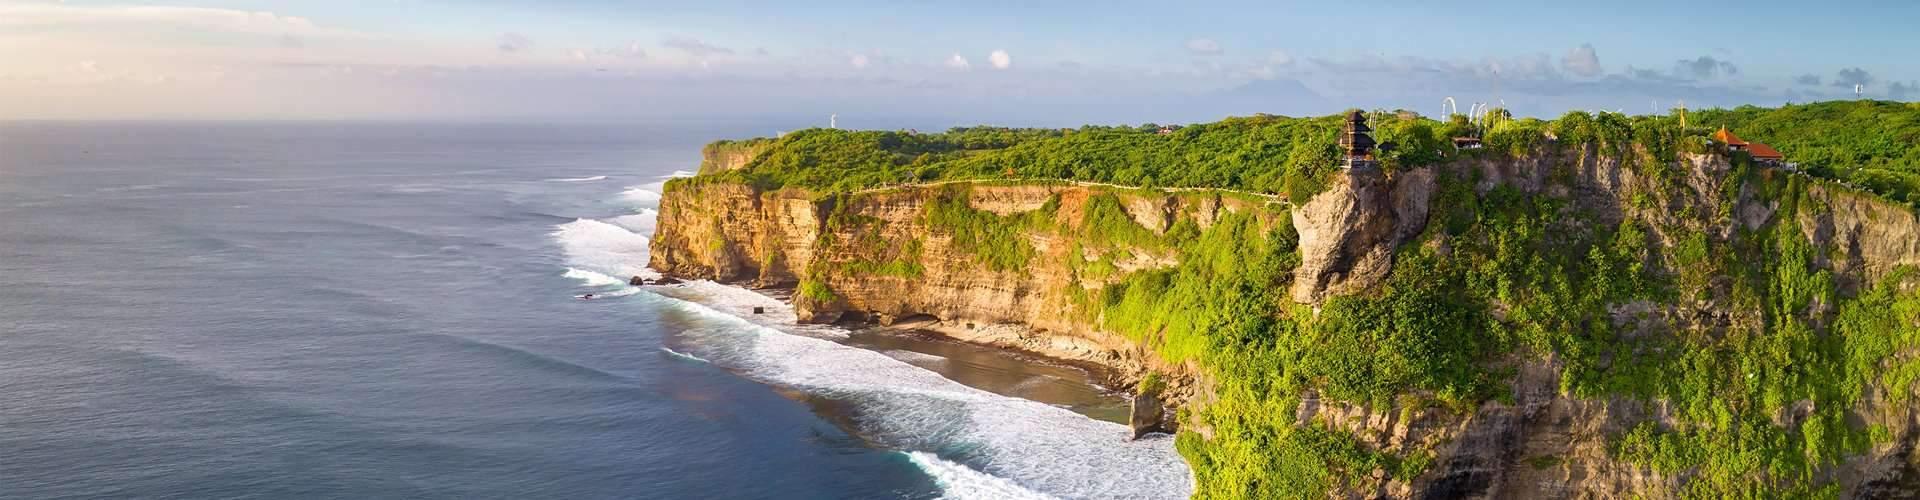 Why to visit Bali